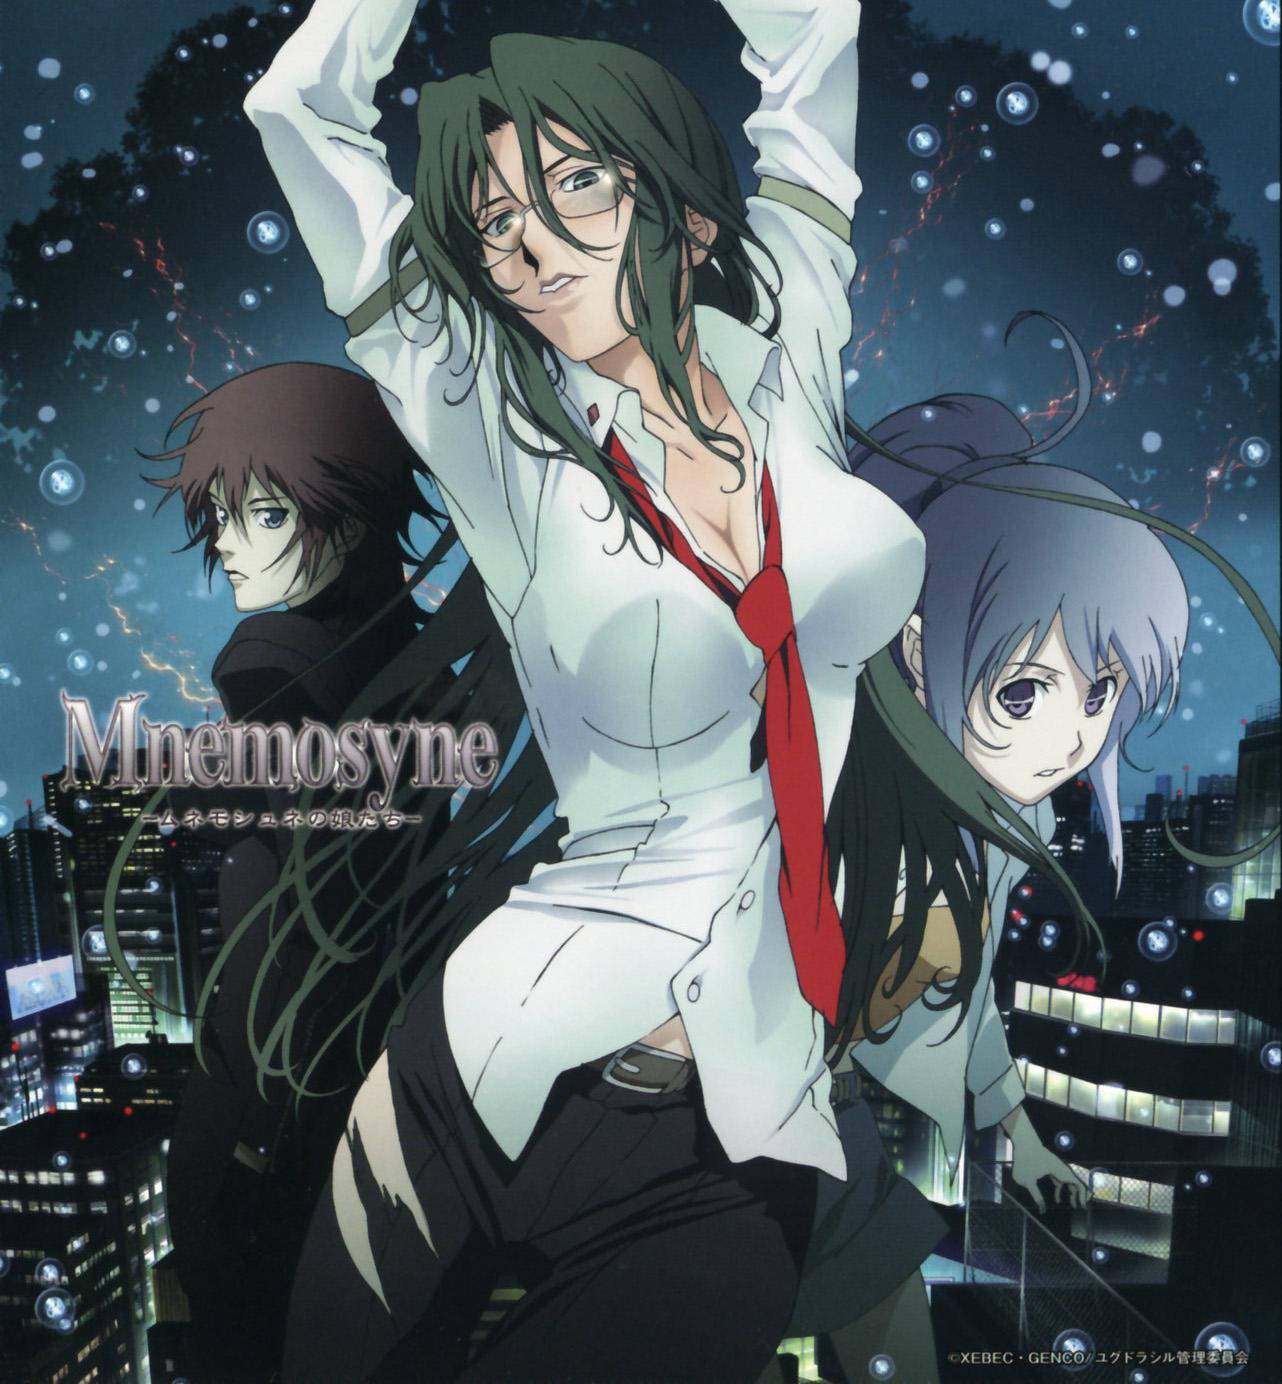 Mnemosyne Anime